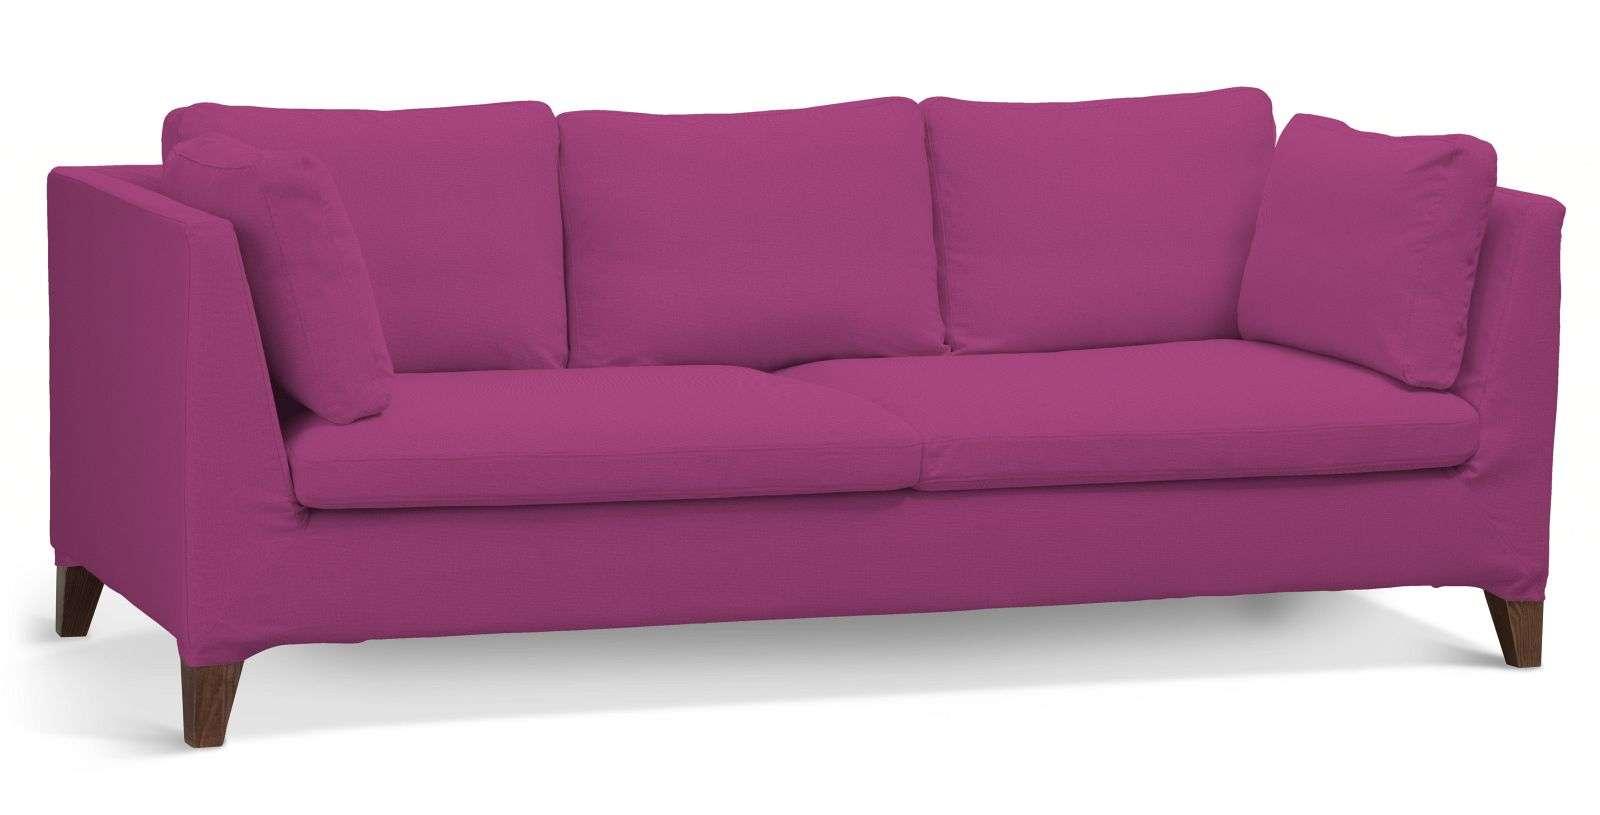 Stockholm 3-Sitzer Sofabezug Stockholm 3-Sitzer von der Kollektion Etna, Stoff: 705-23